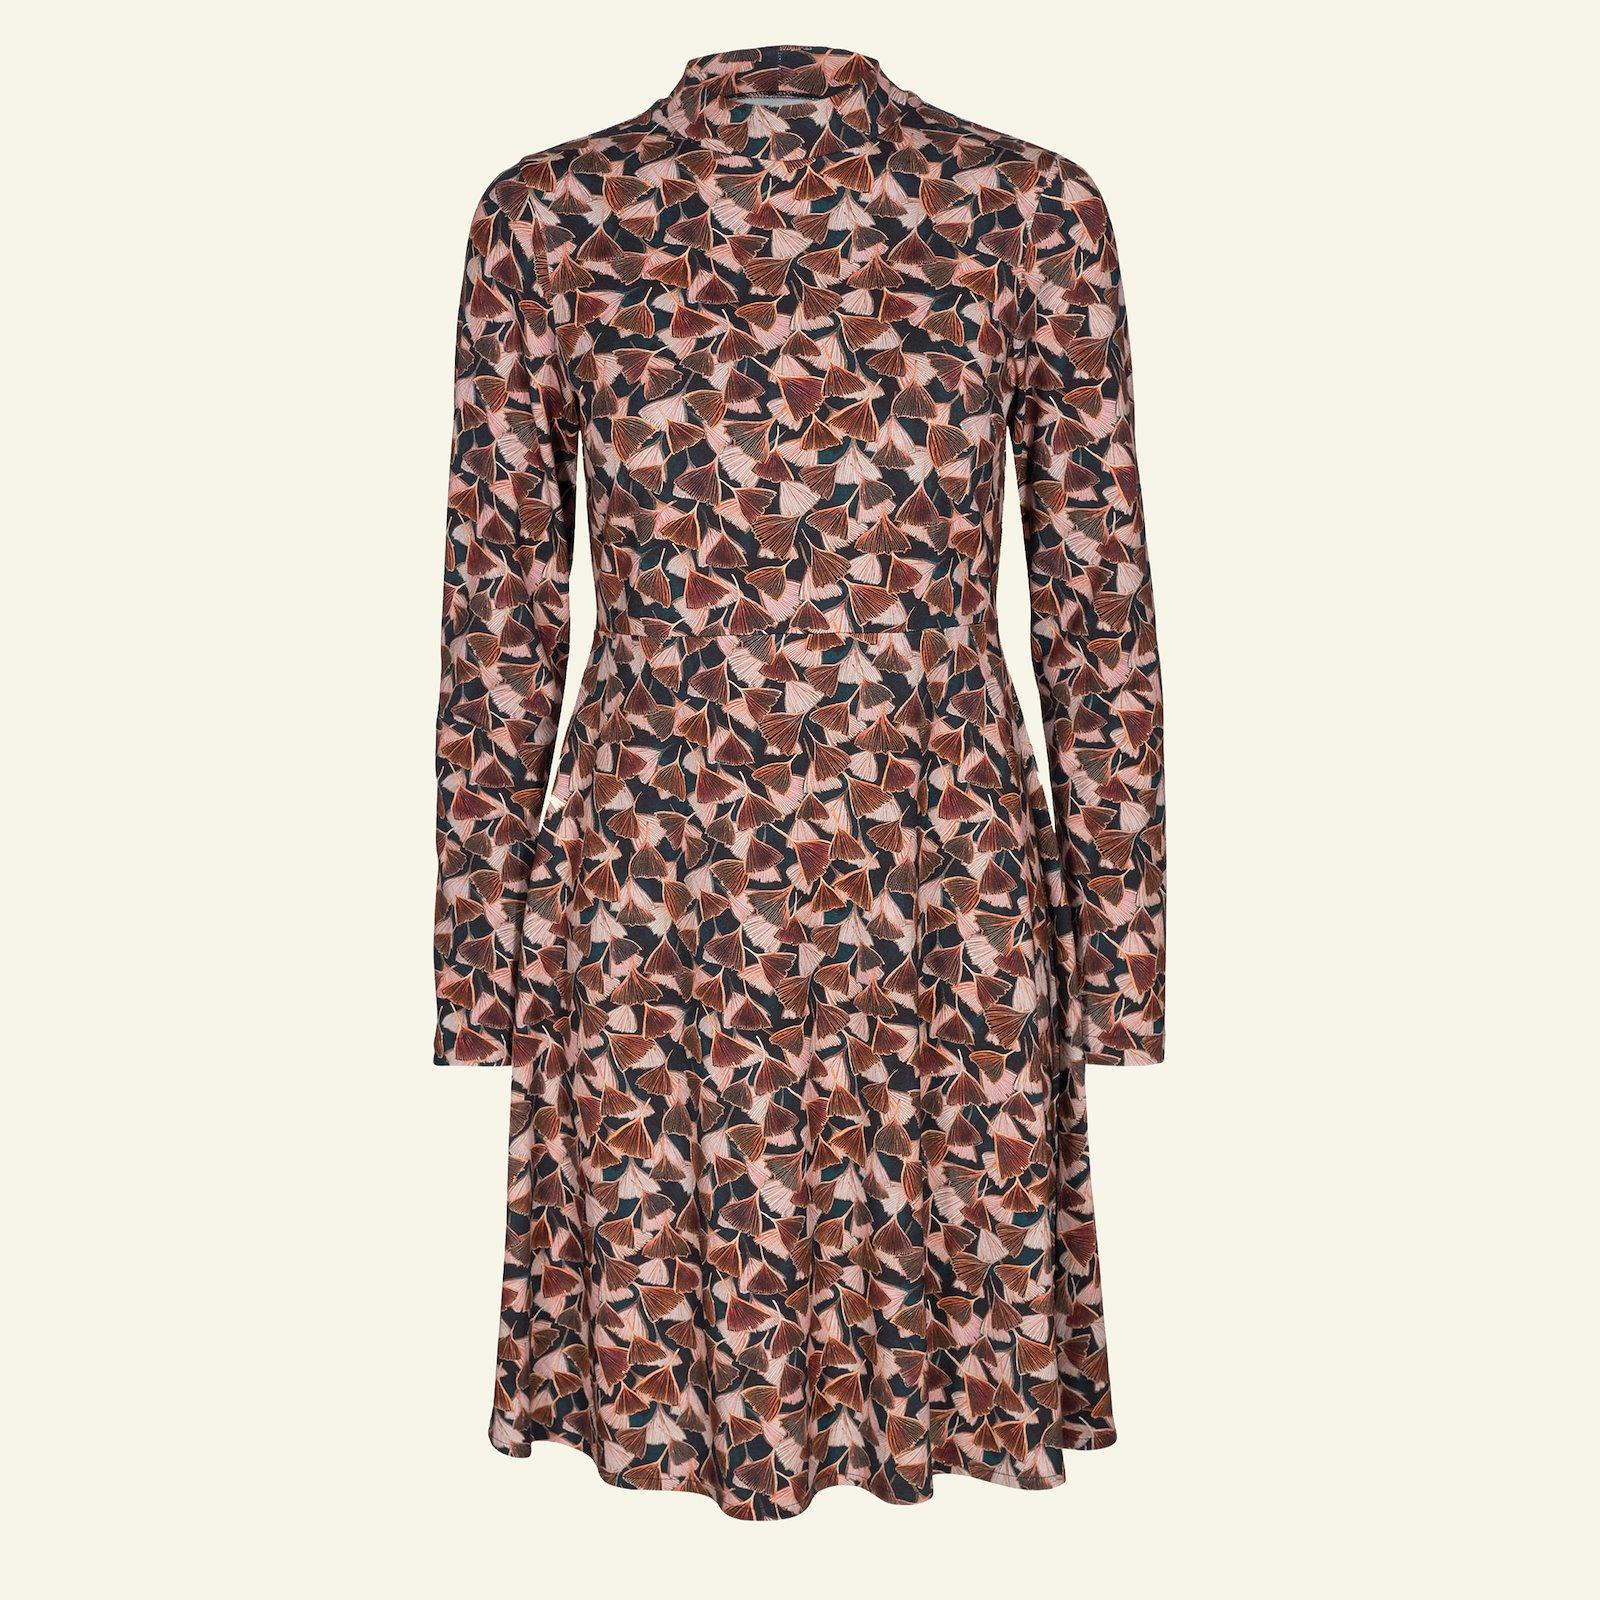 Dress with a full skirt, 46/18 p23154_270029_sskit